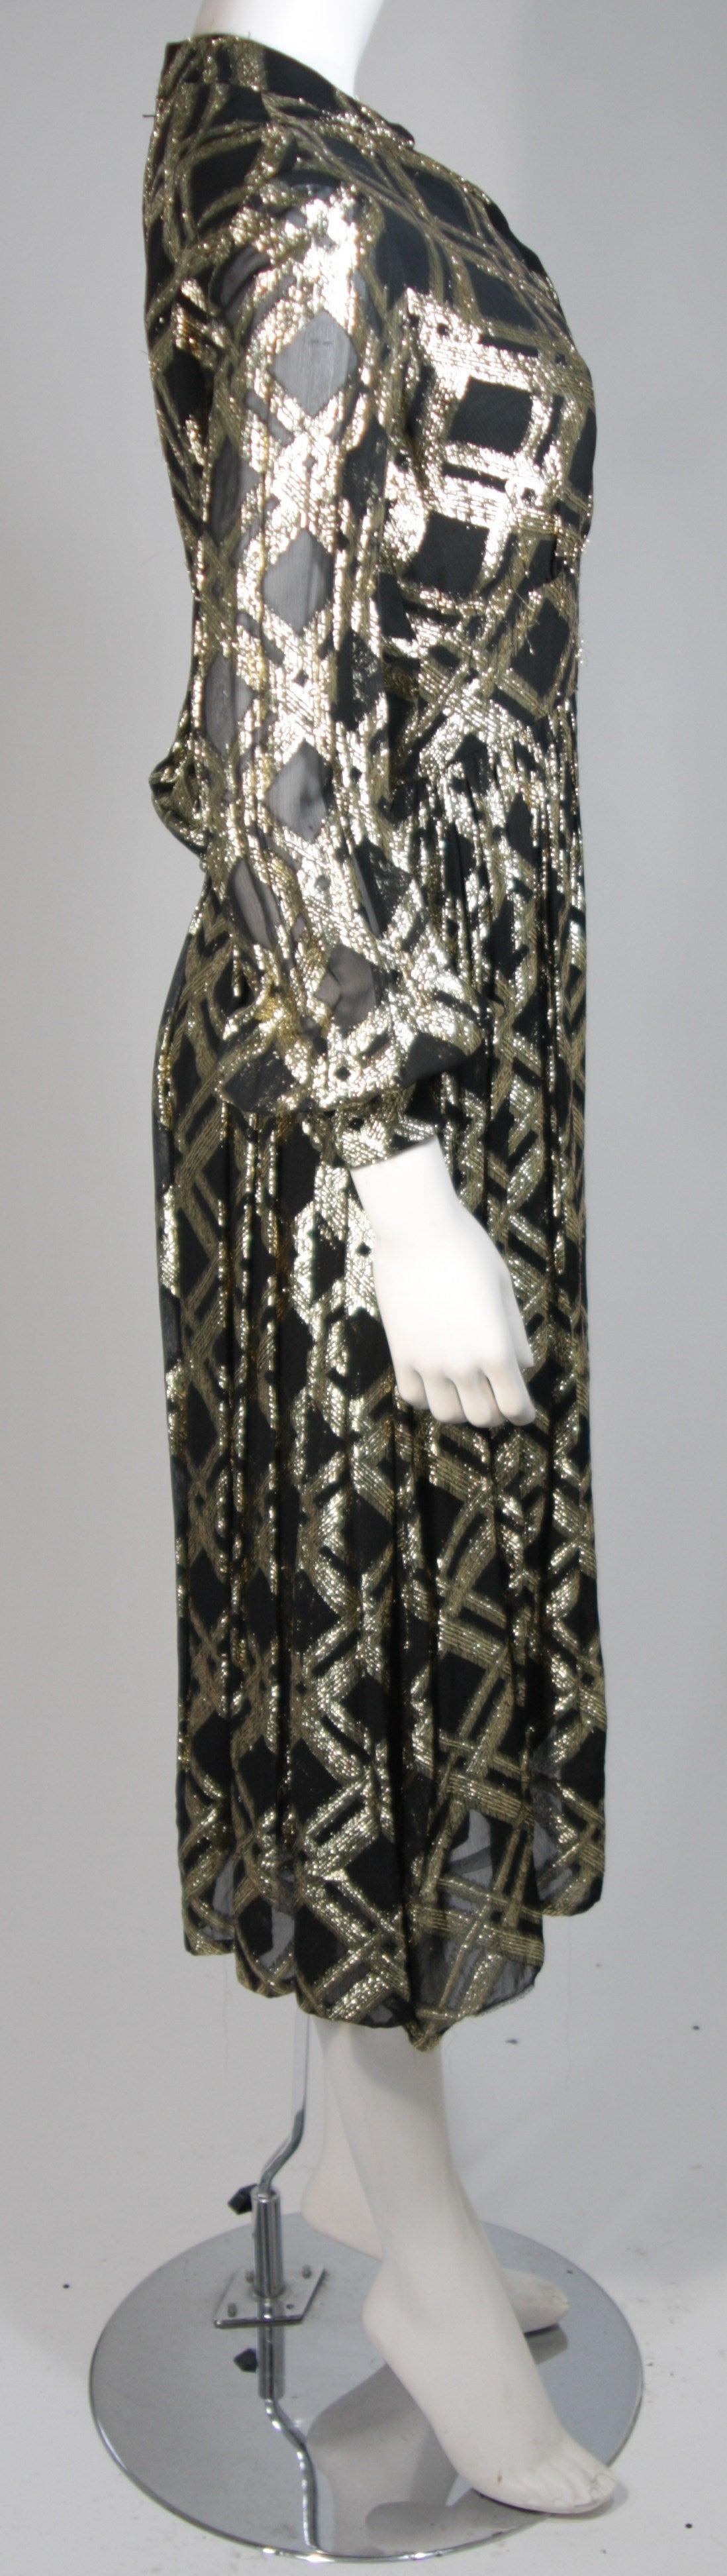 Ceil Chapman Black Silk and Gold Lame Cocktail Dress Size M 6